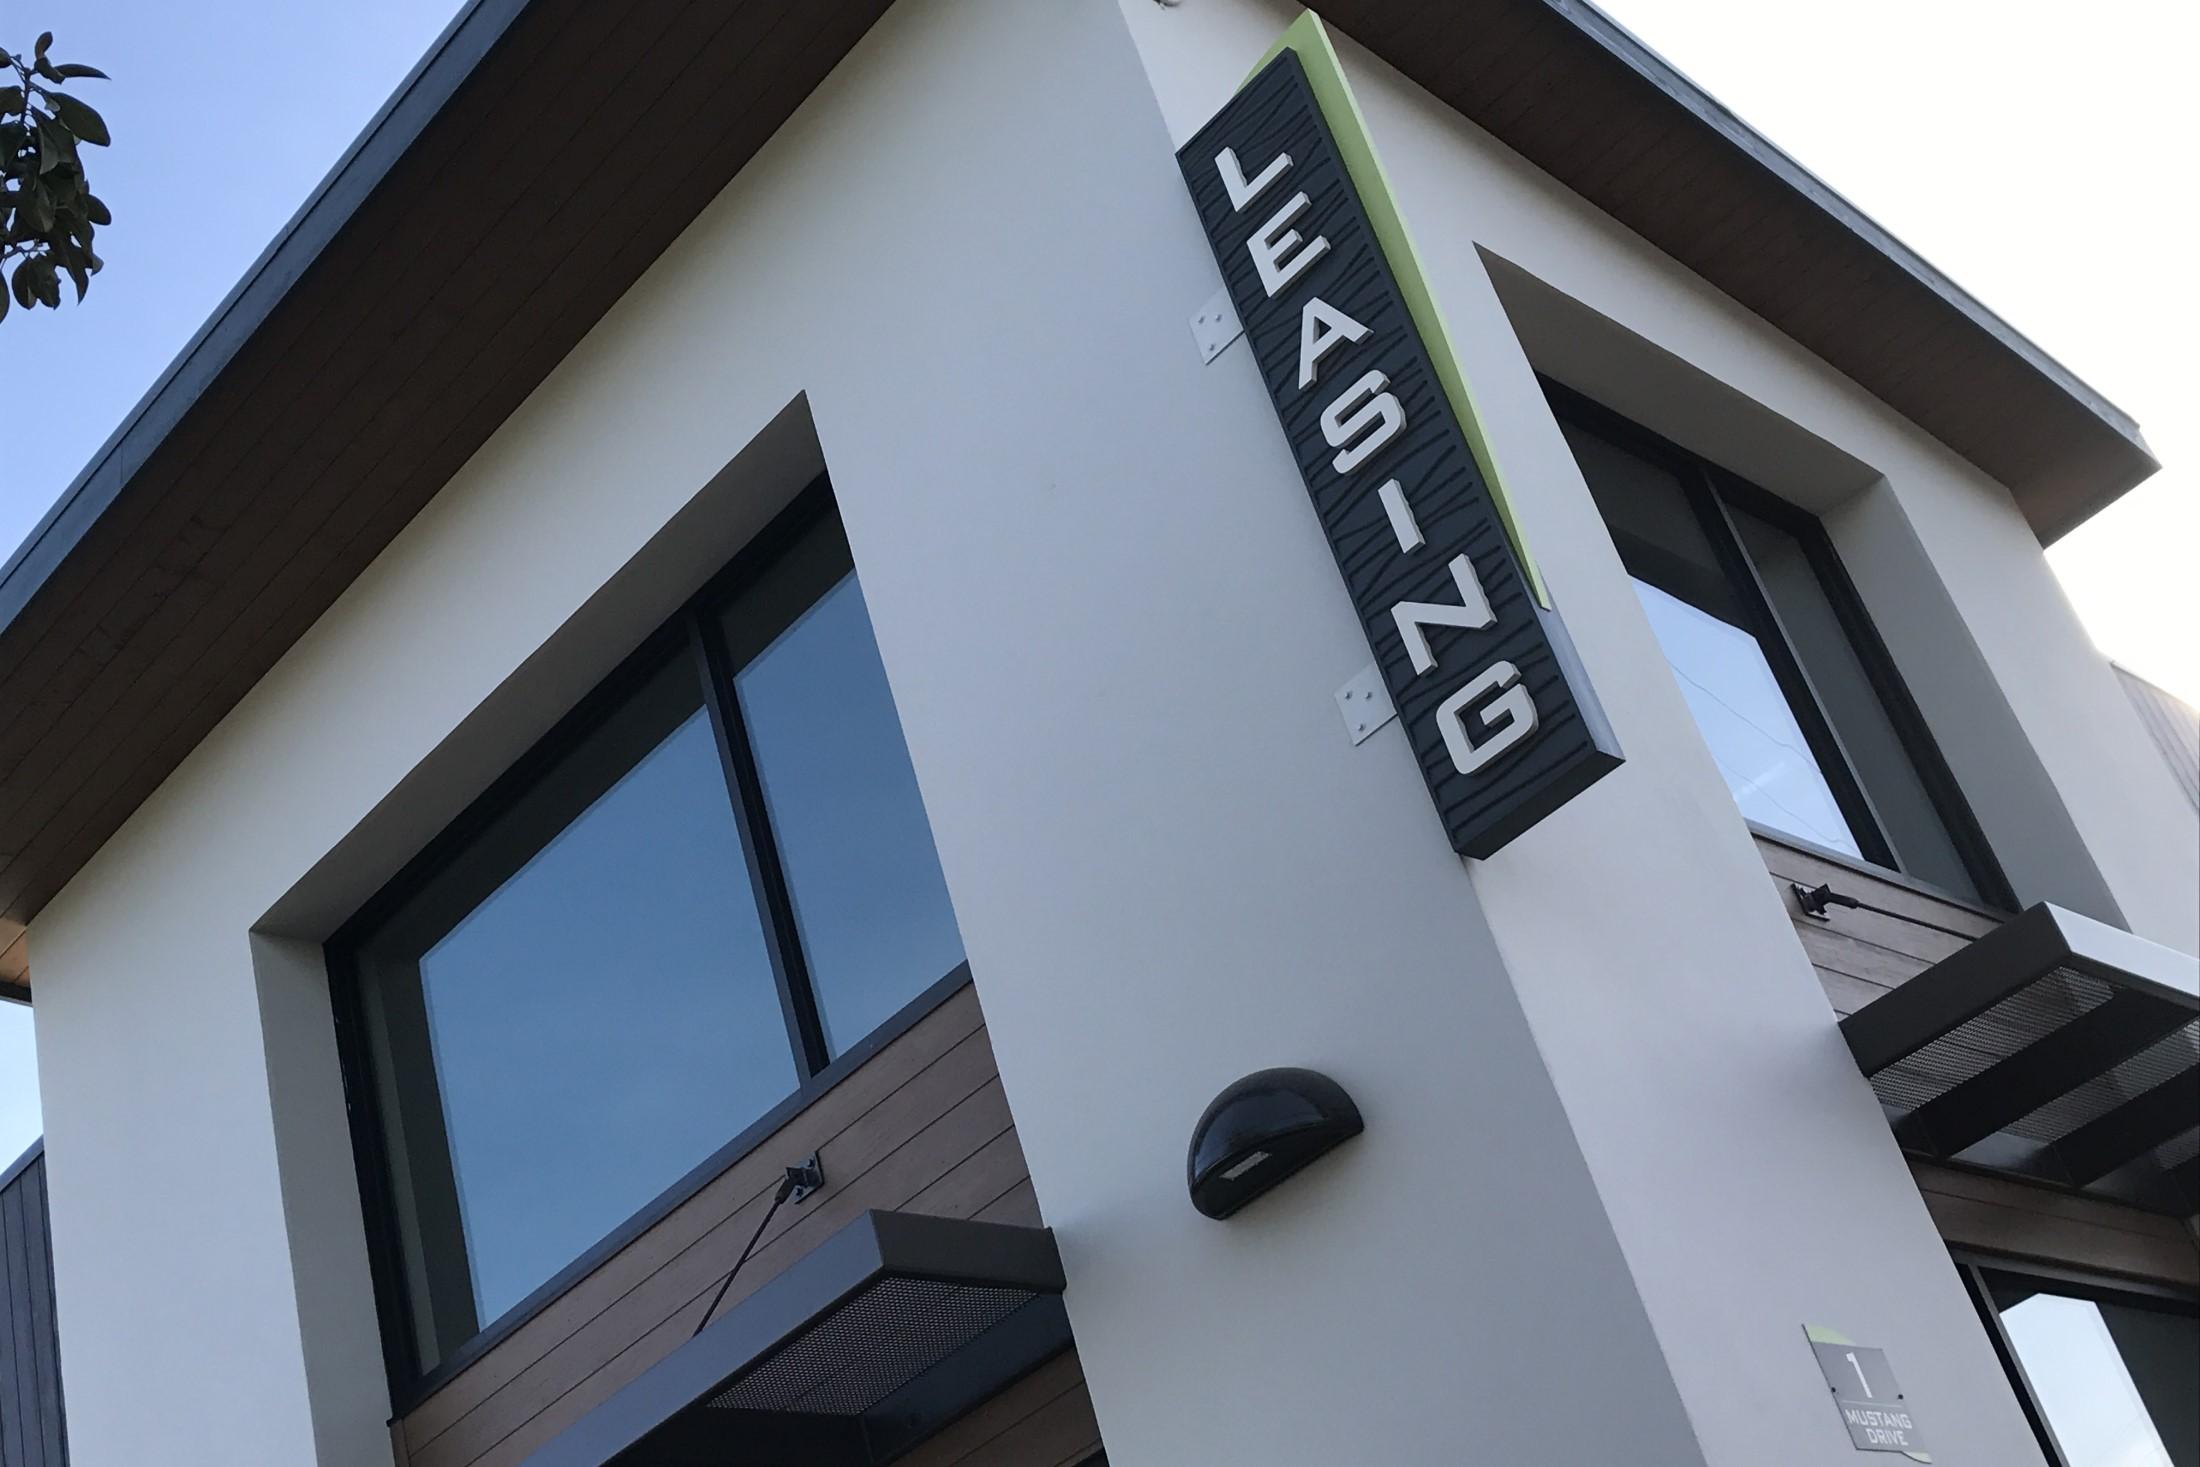 Mustang Village Leasing Office - San Luis Obispo, CA